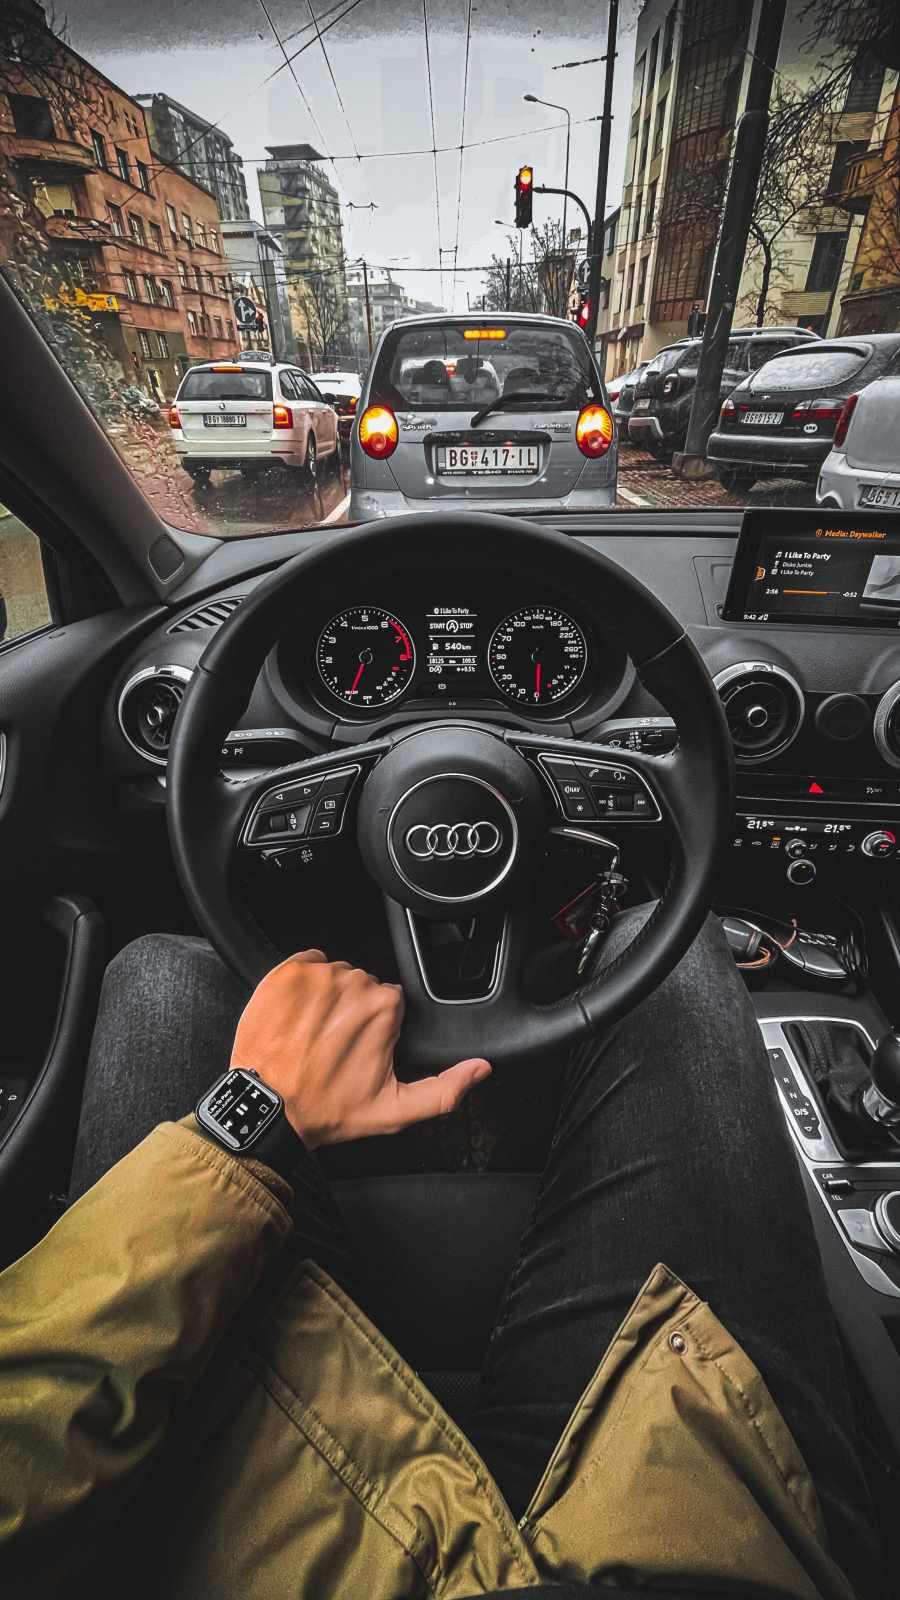 Audi Interior iPhone Wallpaper